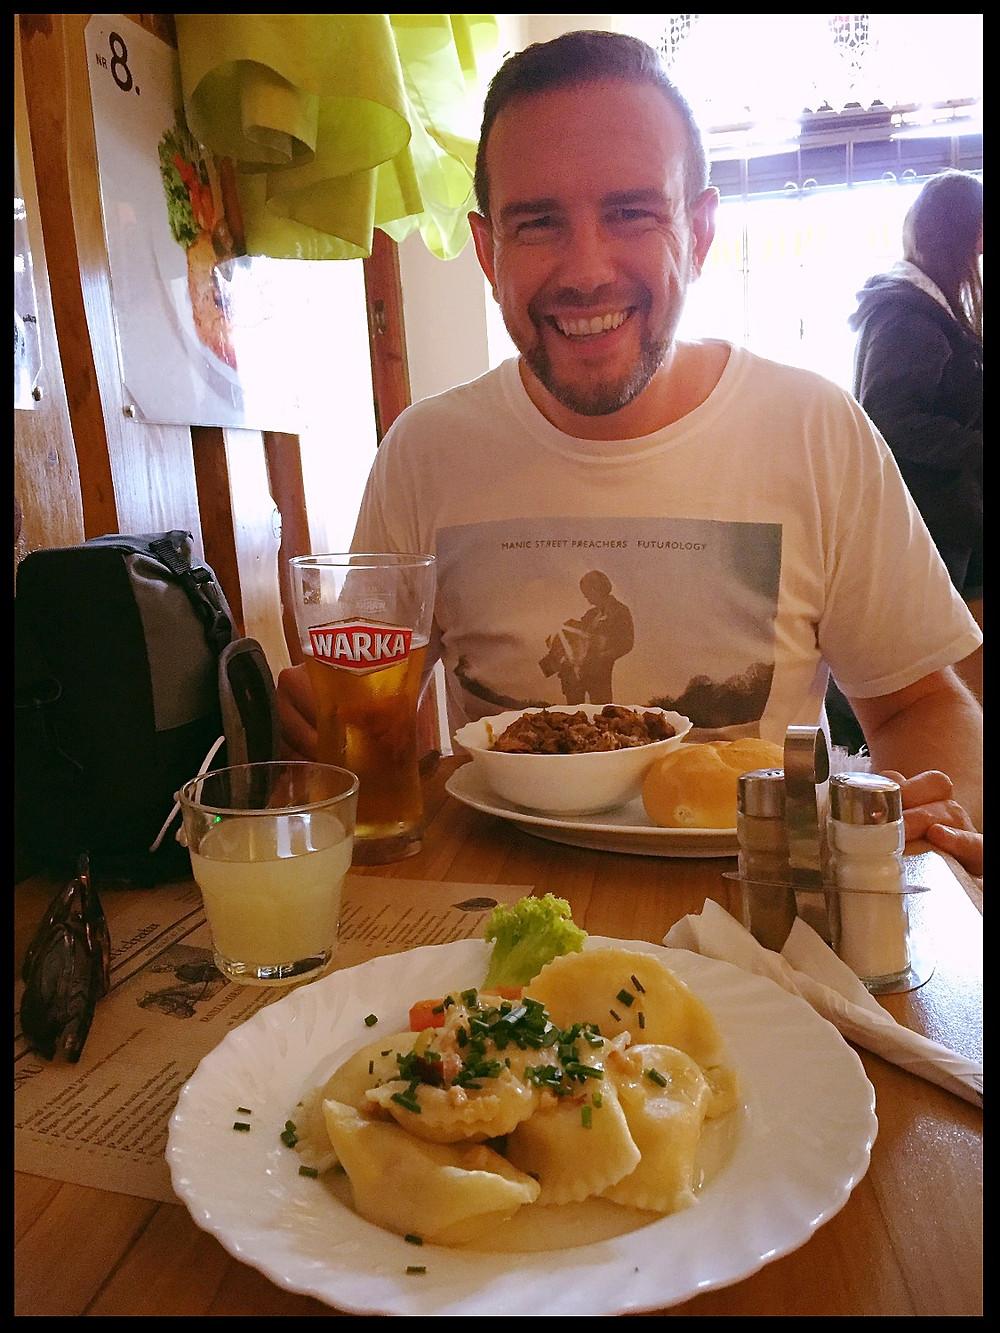 Polish Cuisine Includes Bigos & Pierogi Dishes